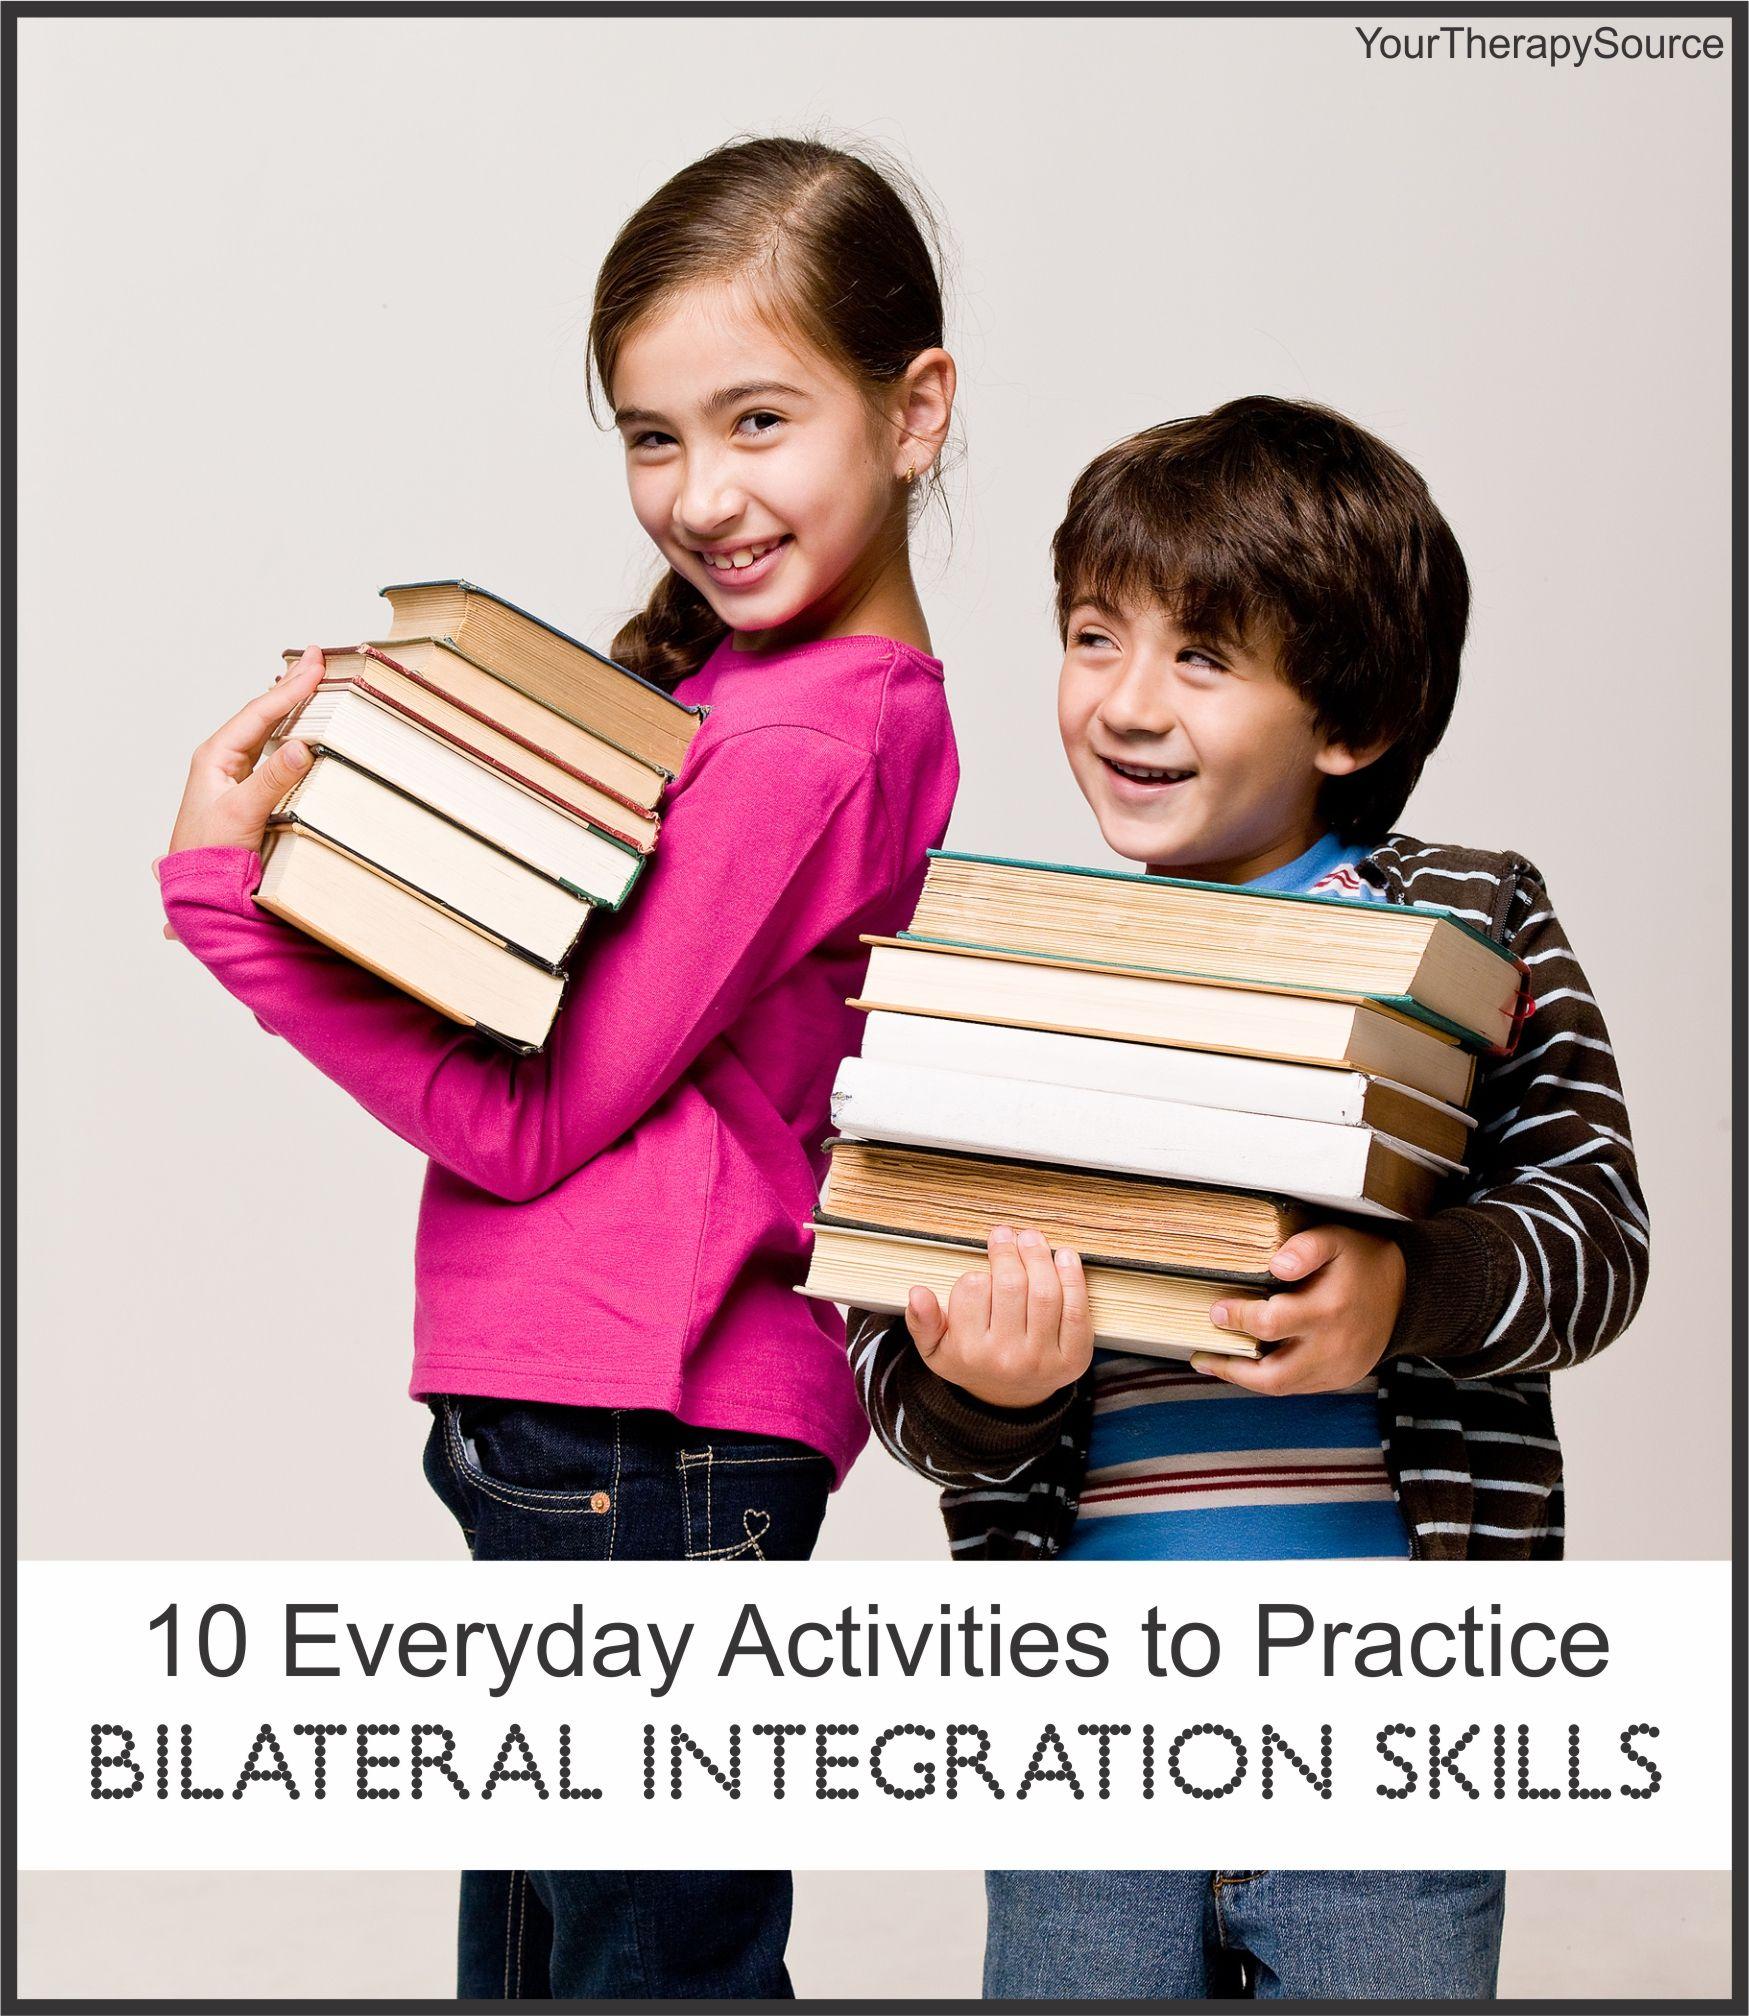 10 Everyday Activities To Practice Bilateral Integration